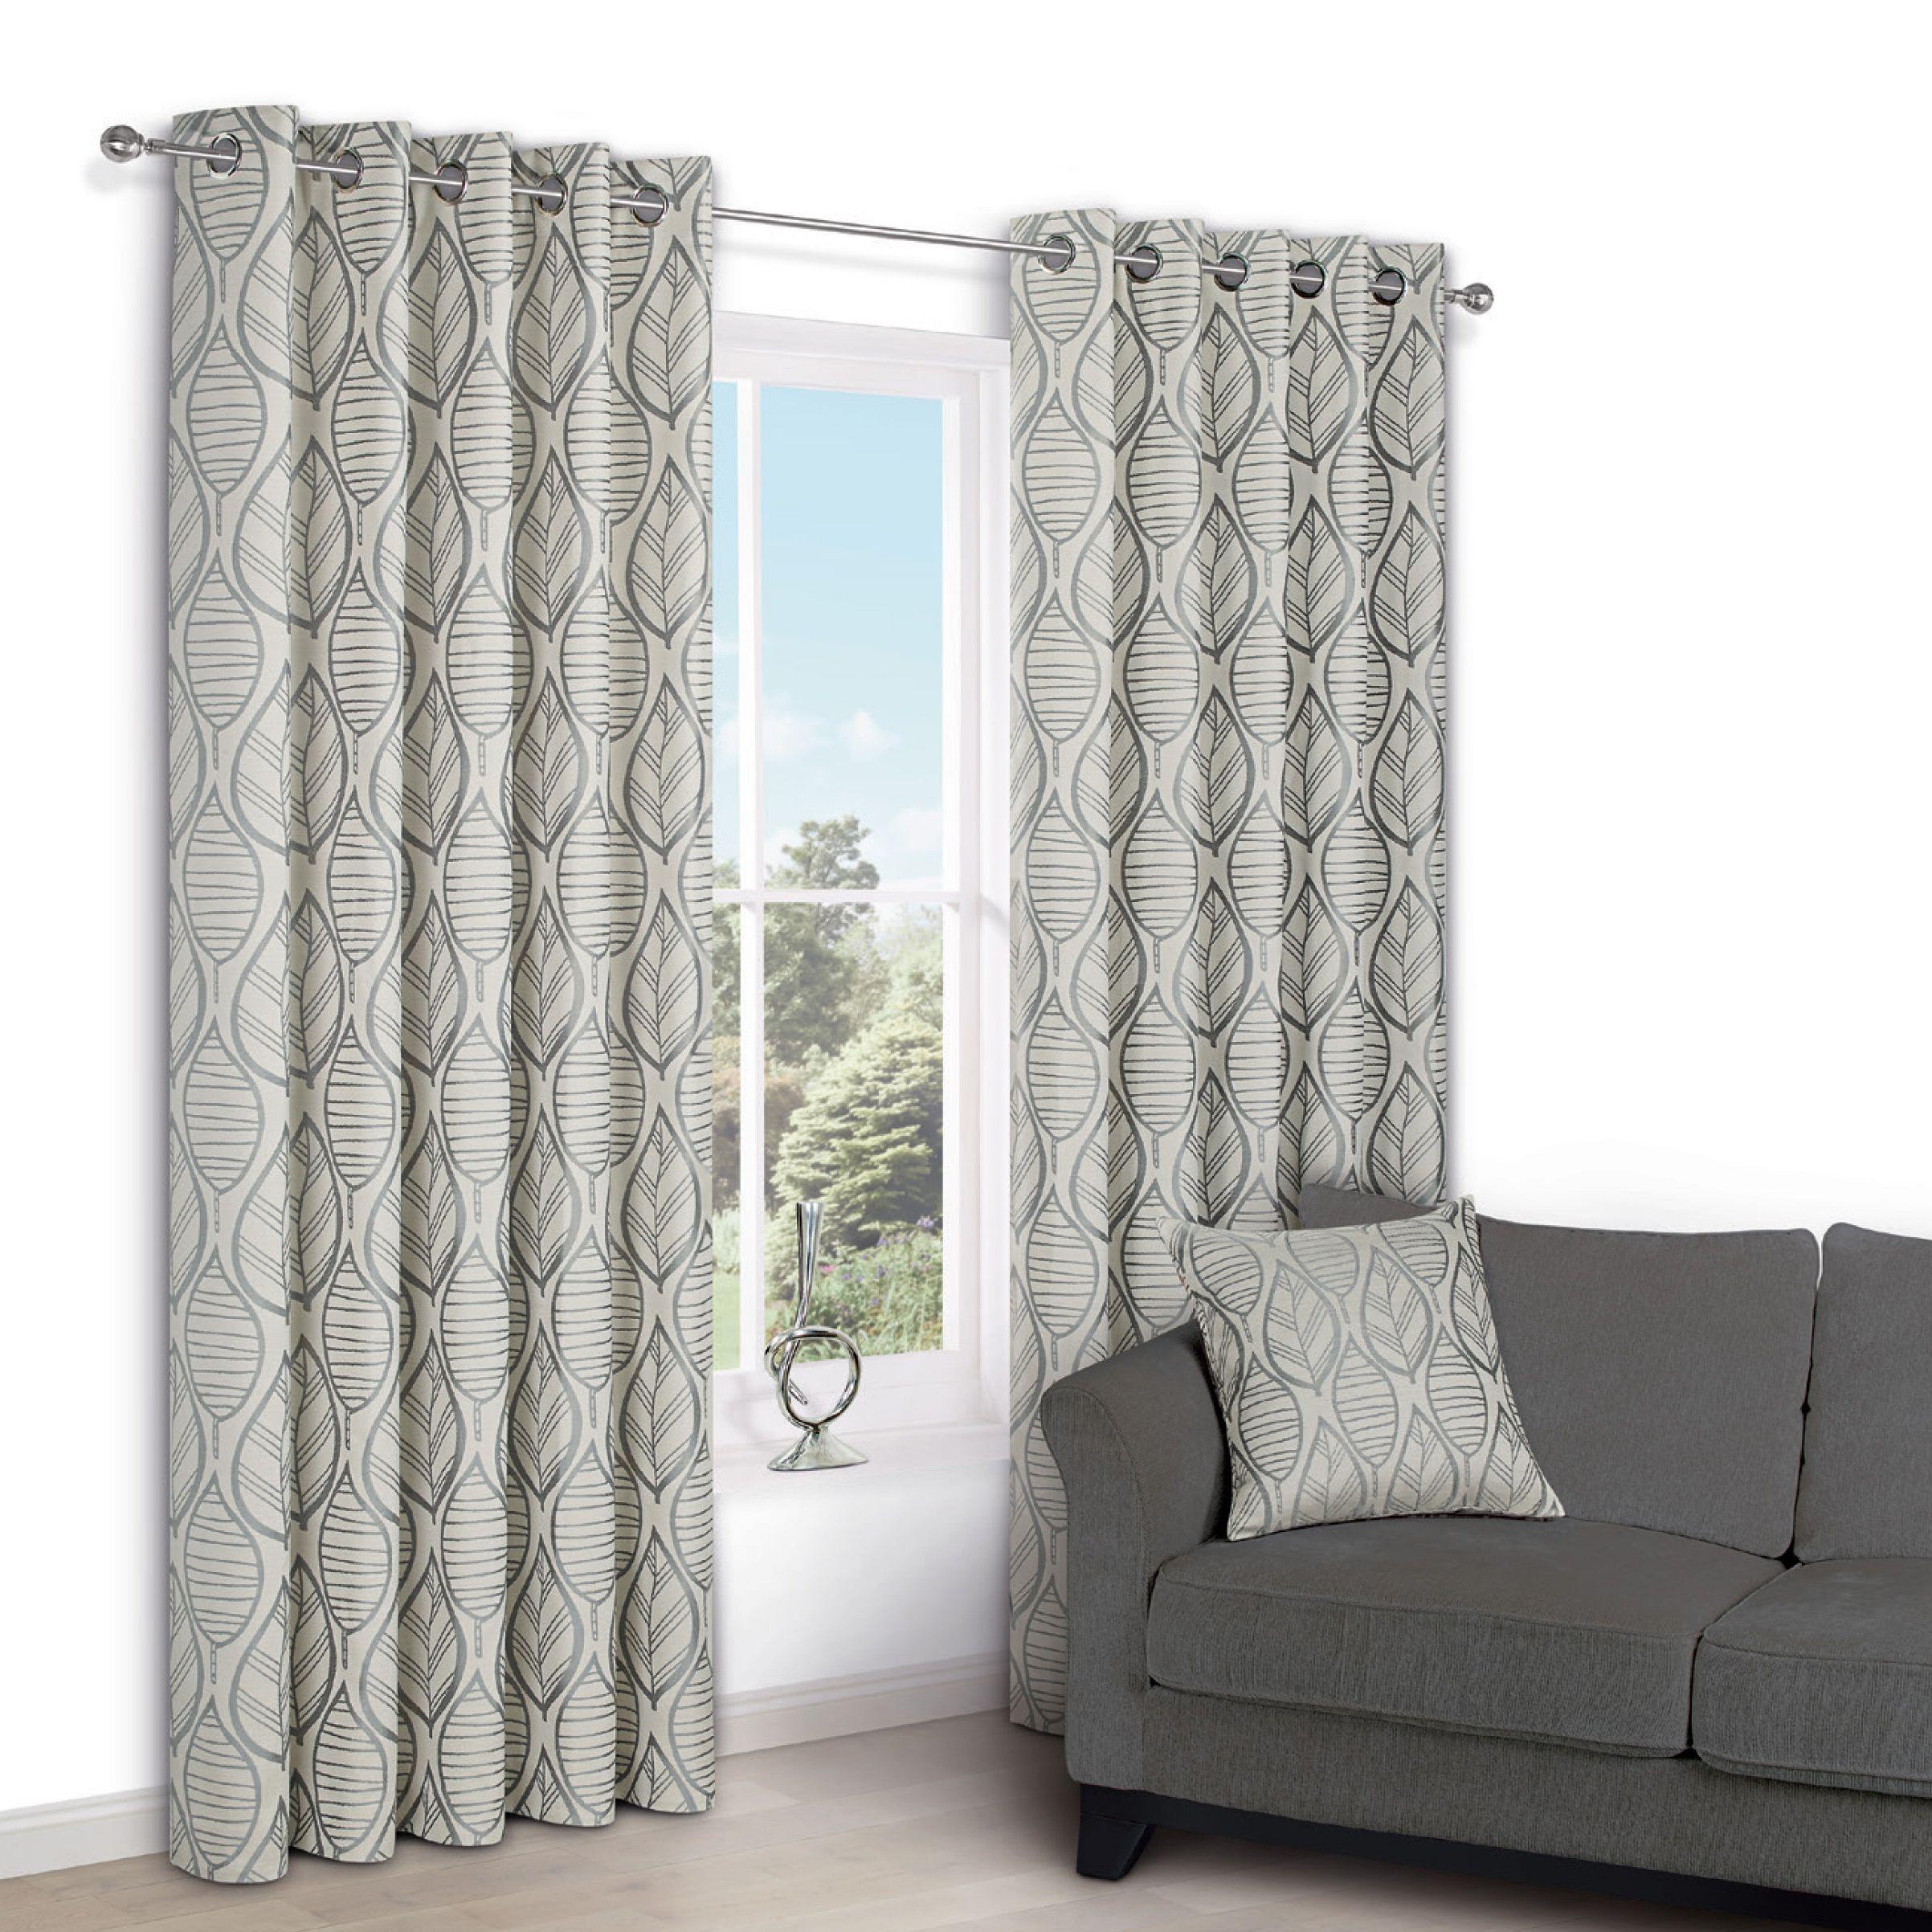 Nordic Cream Leaf Eyelet Lined Curtains W 117 Cm L 137